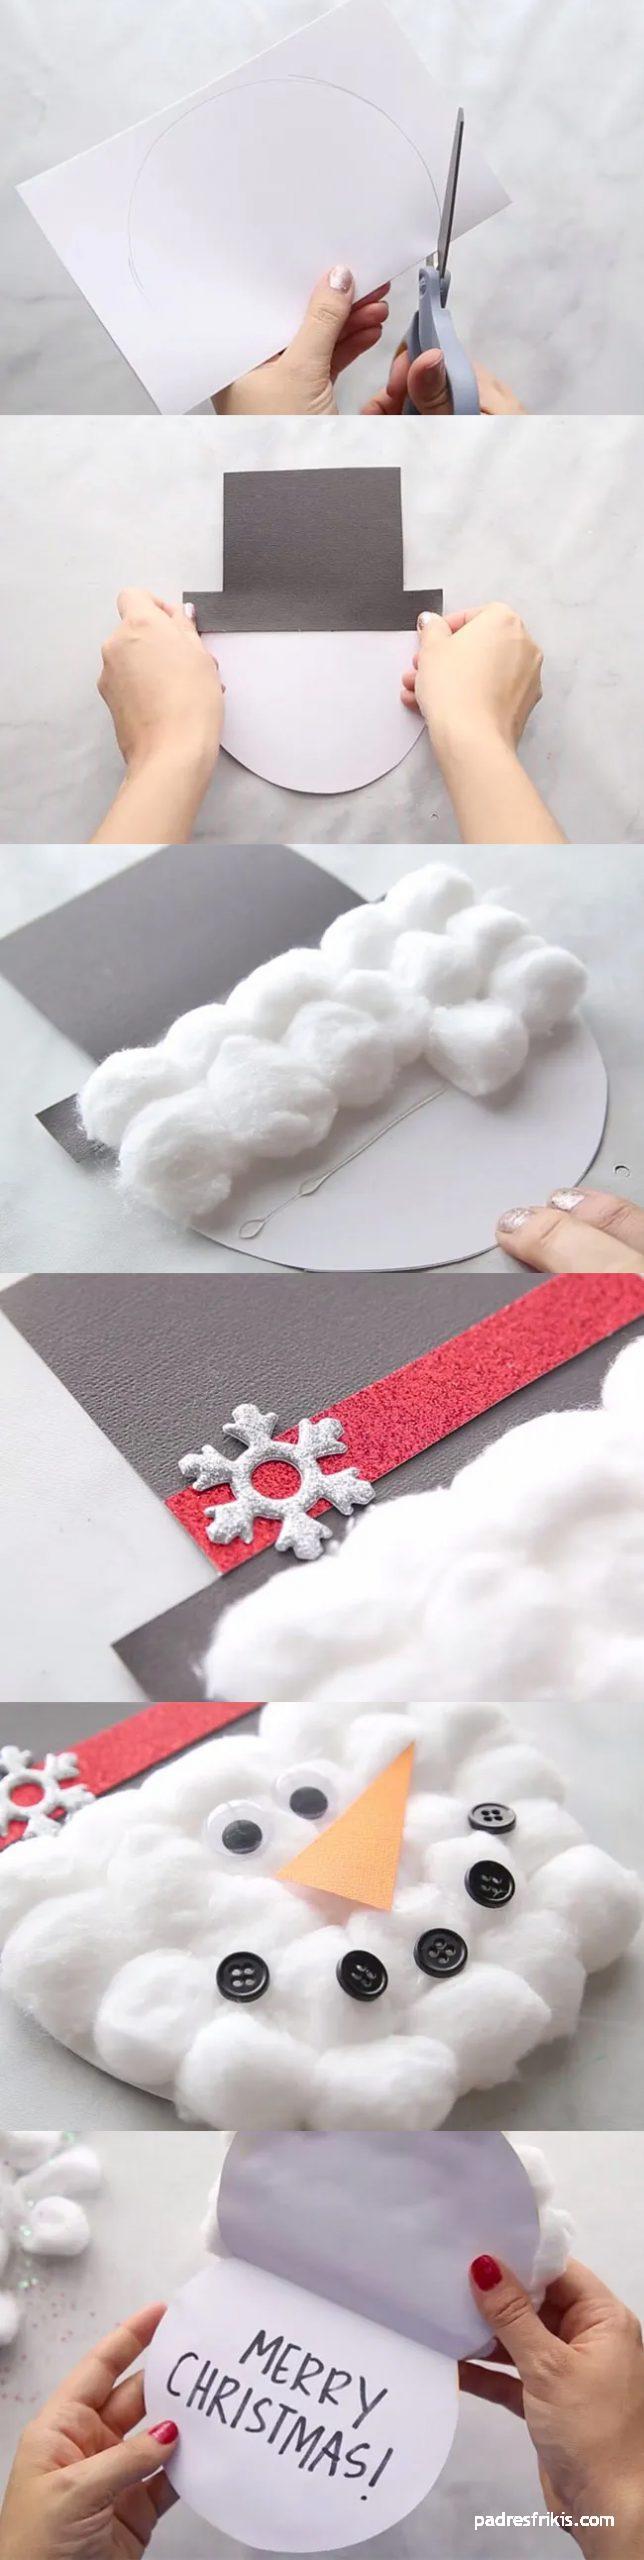 tarjeta de navidad muñeco de nieve